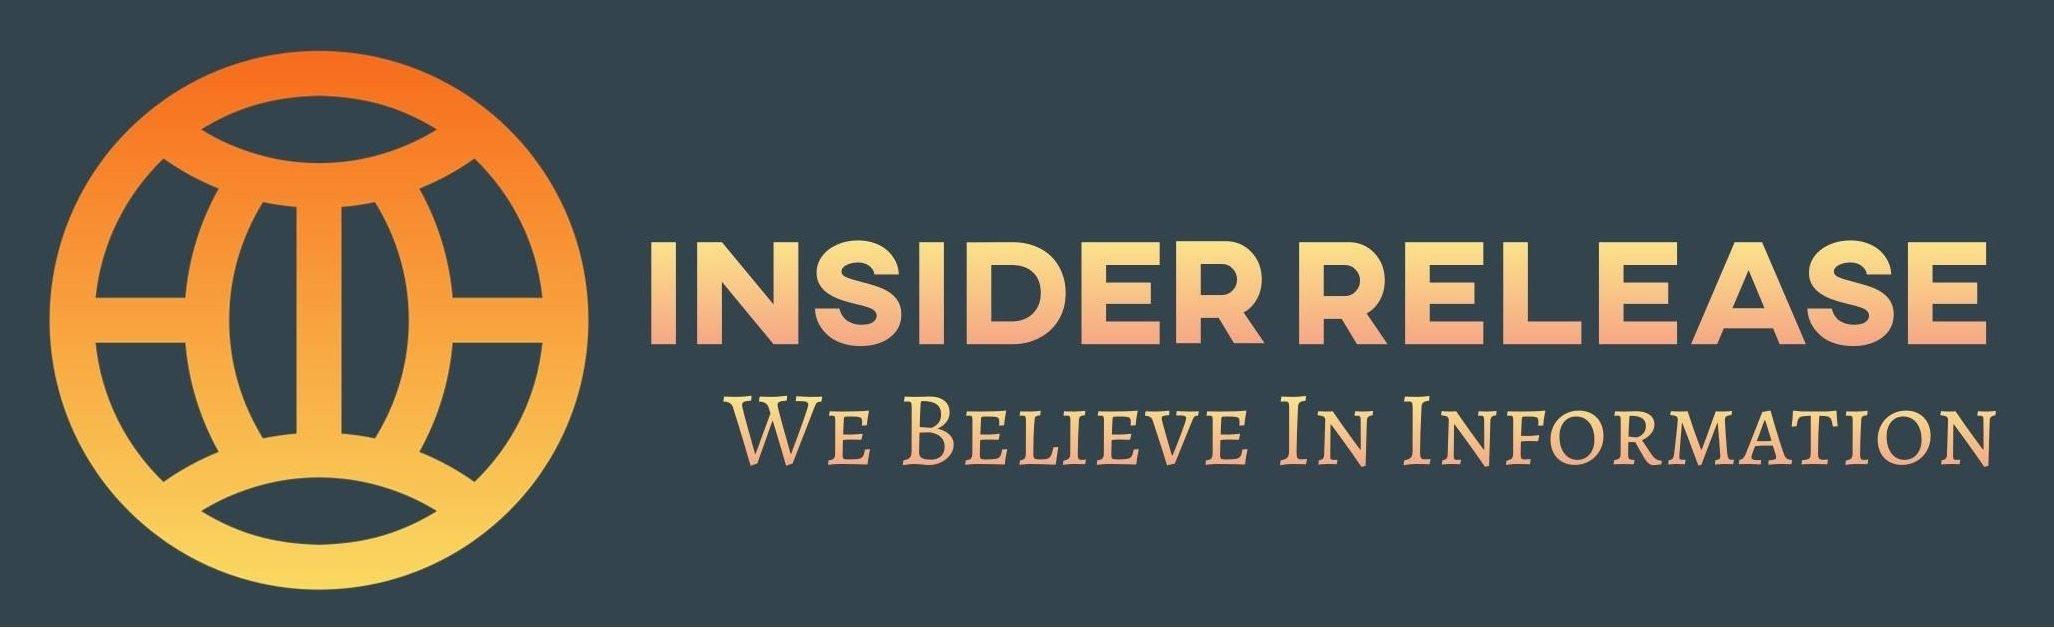 Insider Release